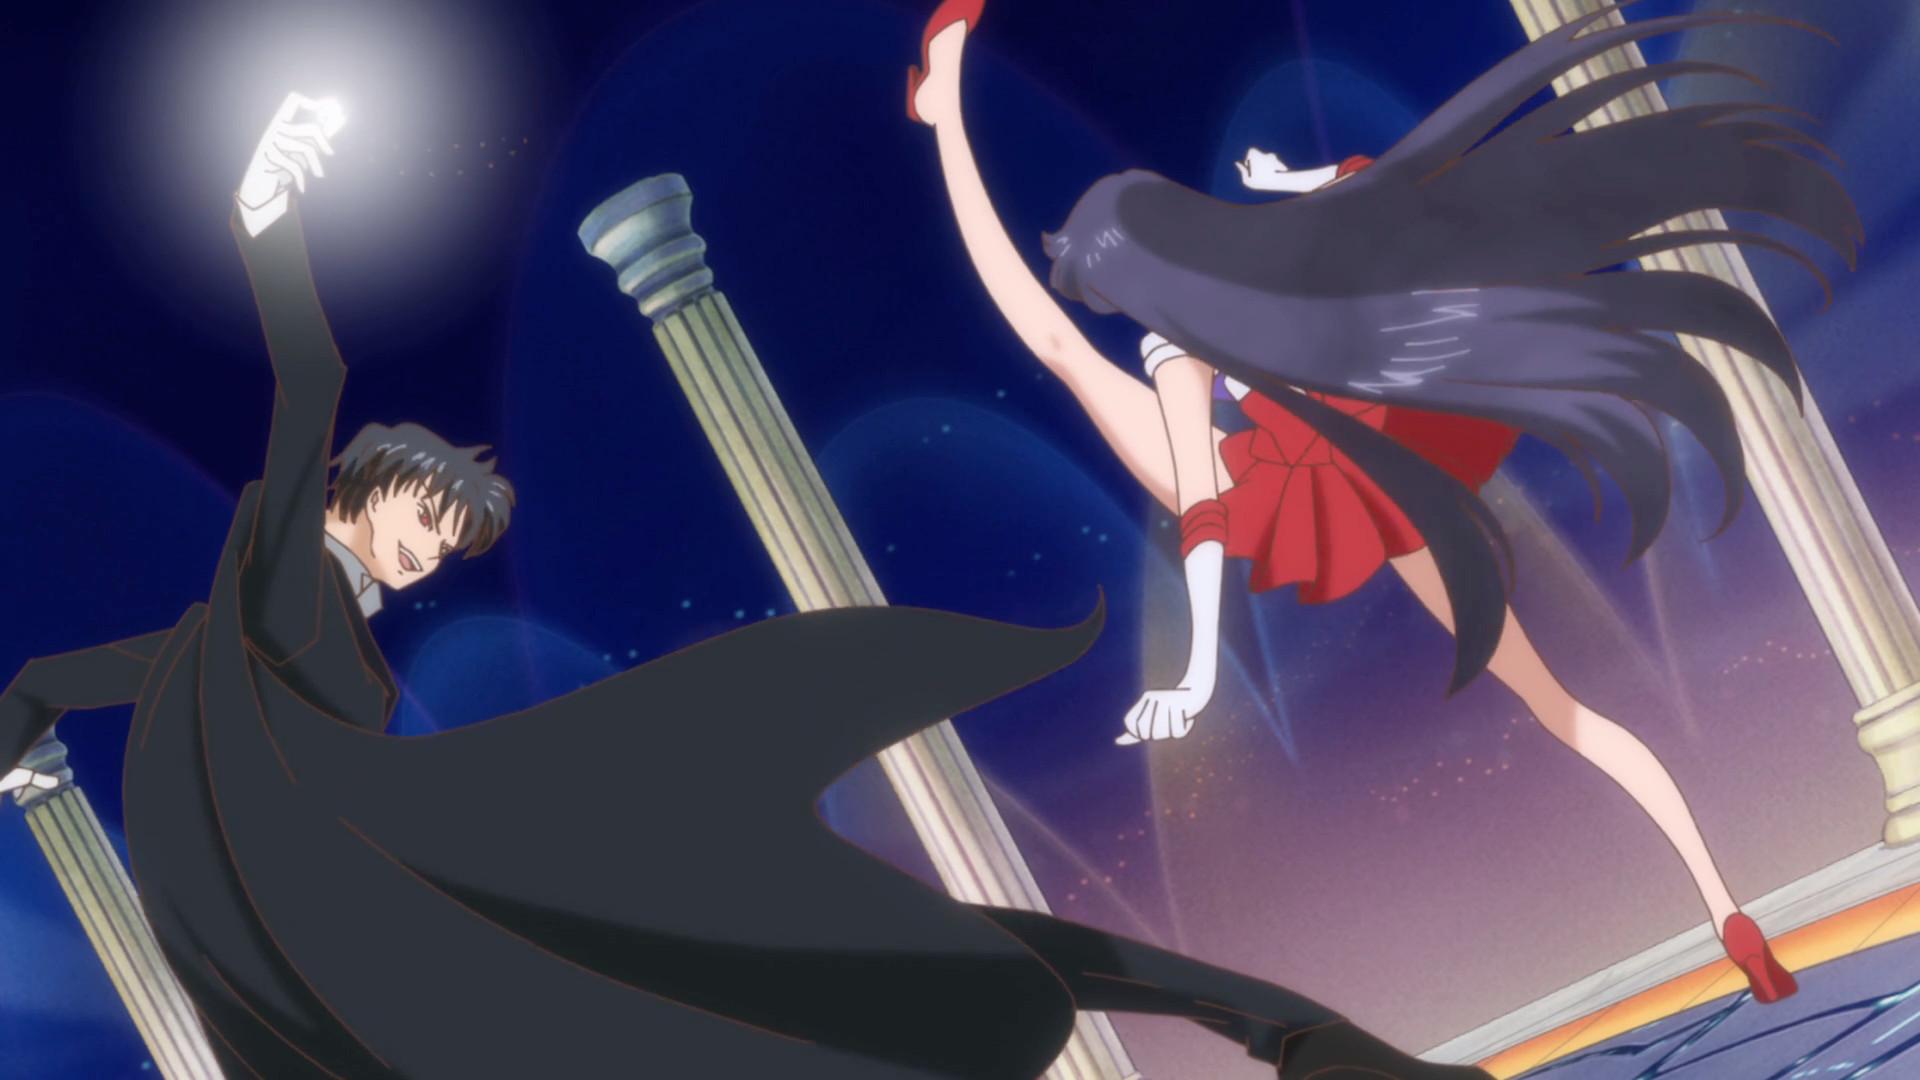 Image Result For Anime Wallpaper Deviantarta